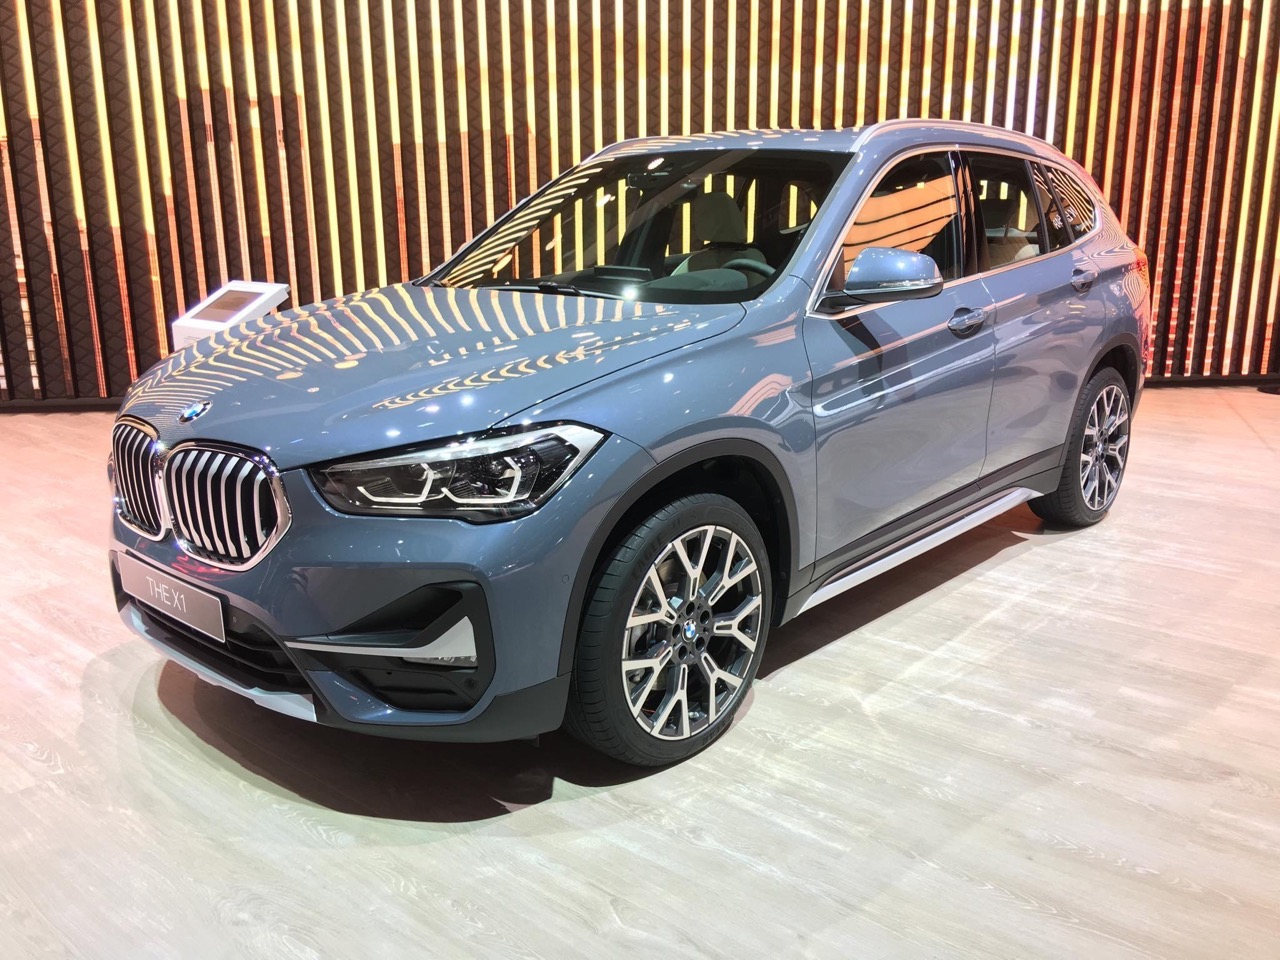 BMW X1 - Salone di Francoforte 2019